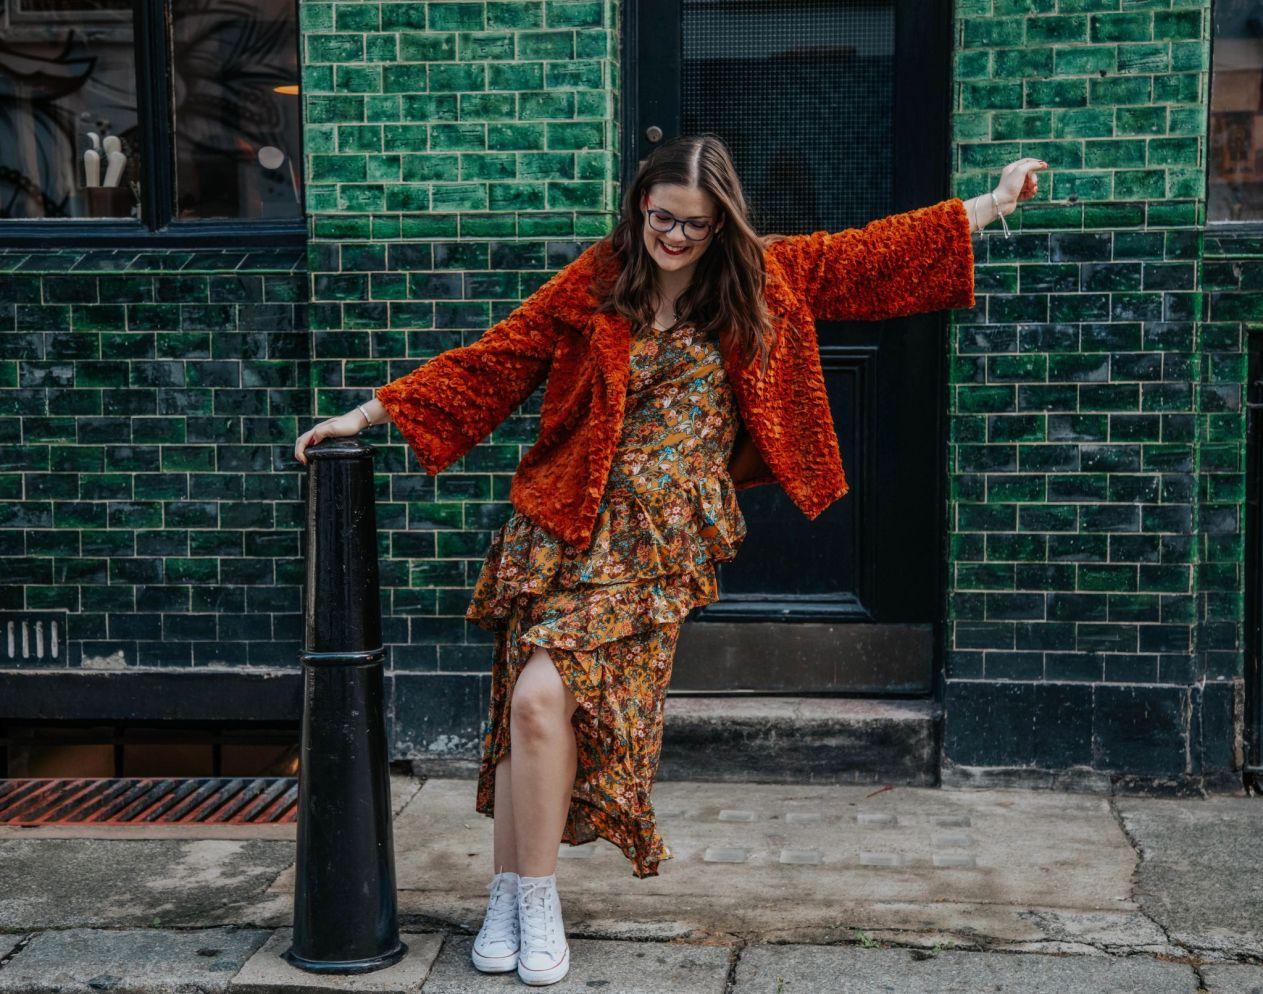 Kate Winney Little Miss Winney Hating Instagram Comparison Orange Jacket Asos Glasses